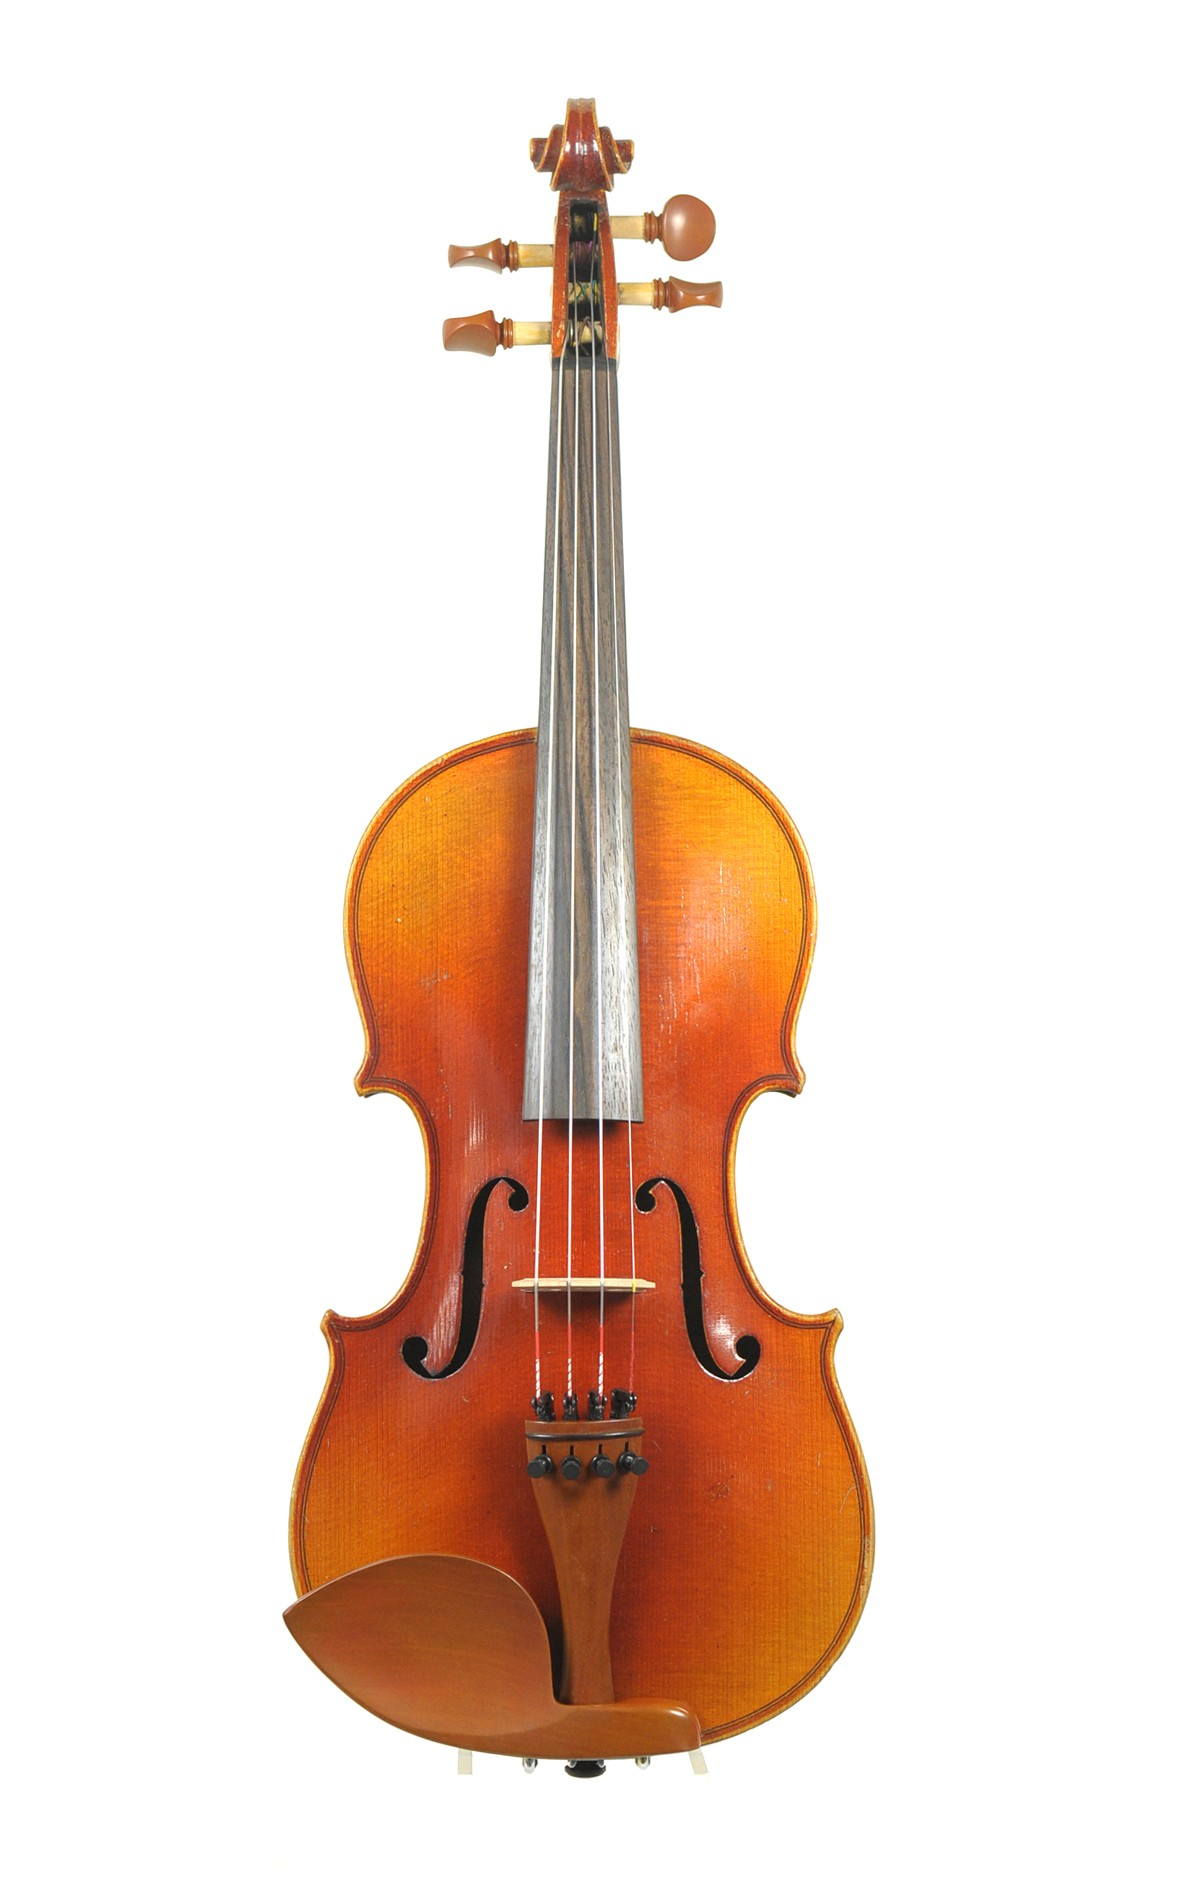 3/4 - German student violin, Saxony 1950ies - top